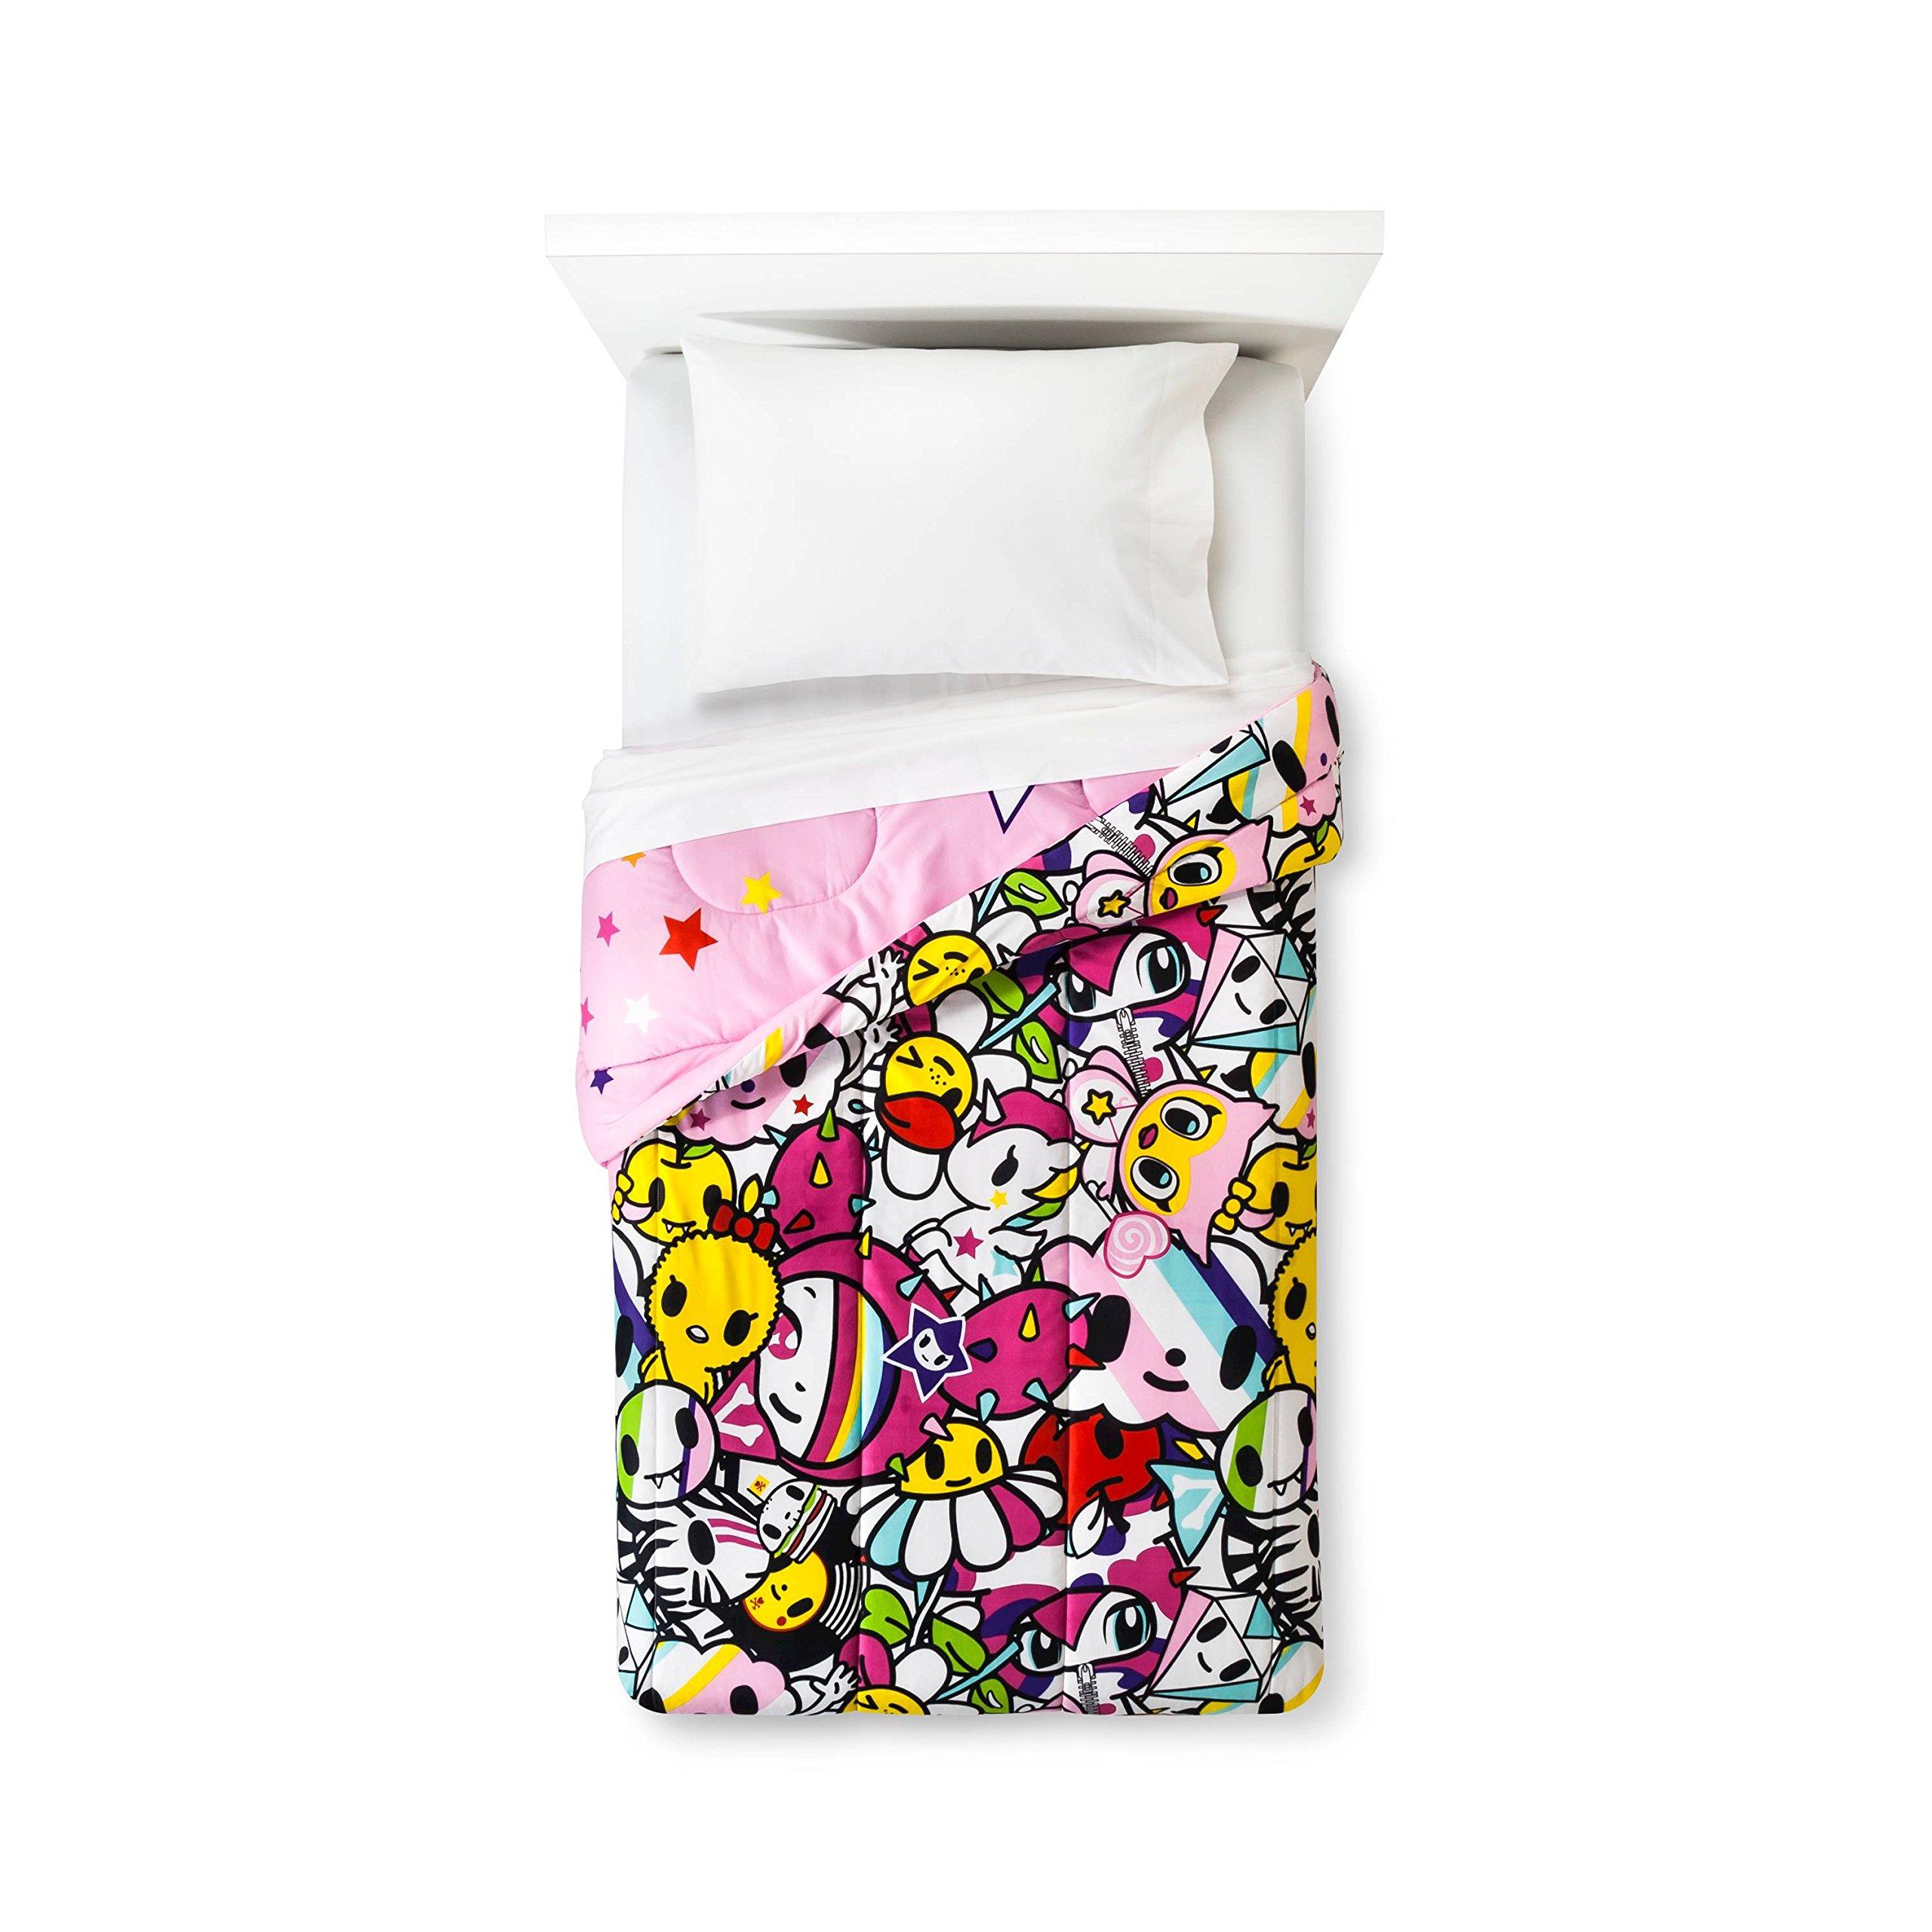 Neonstar by Tokidoki I Love Unicorns 4pc Bedding Set Comforter + Sheets (Twin Size) by Jay Franco (Image #2)